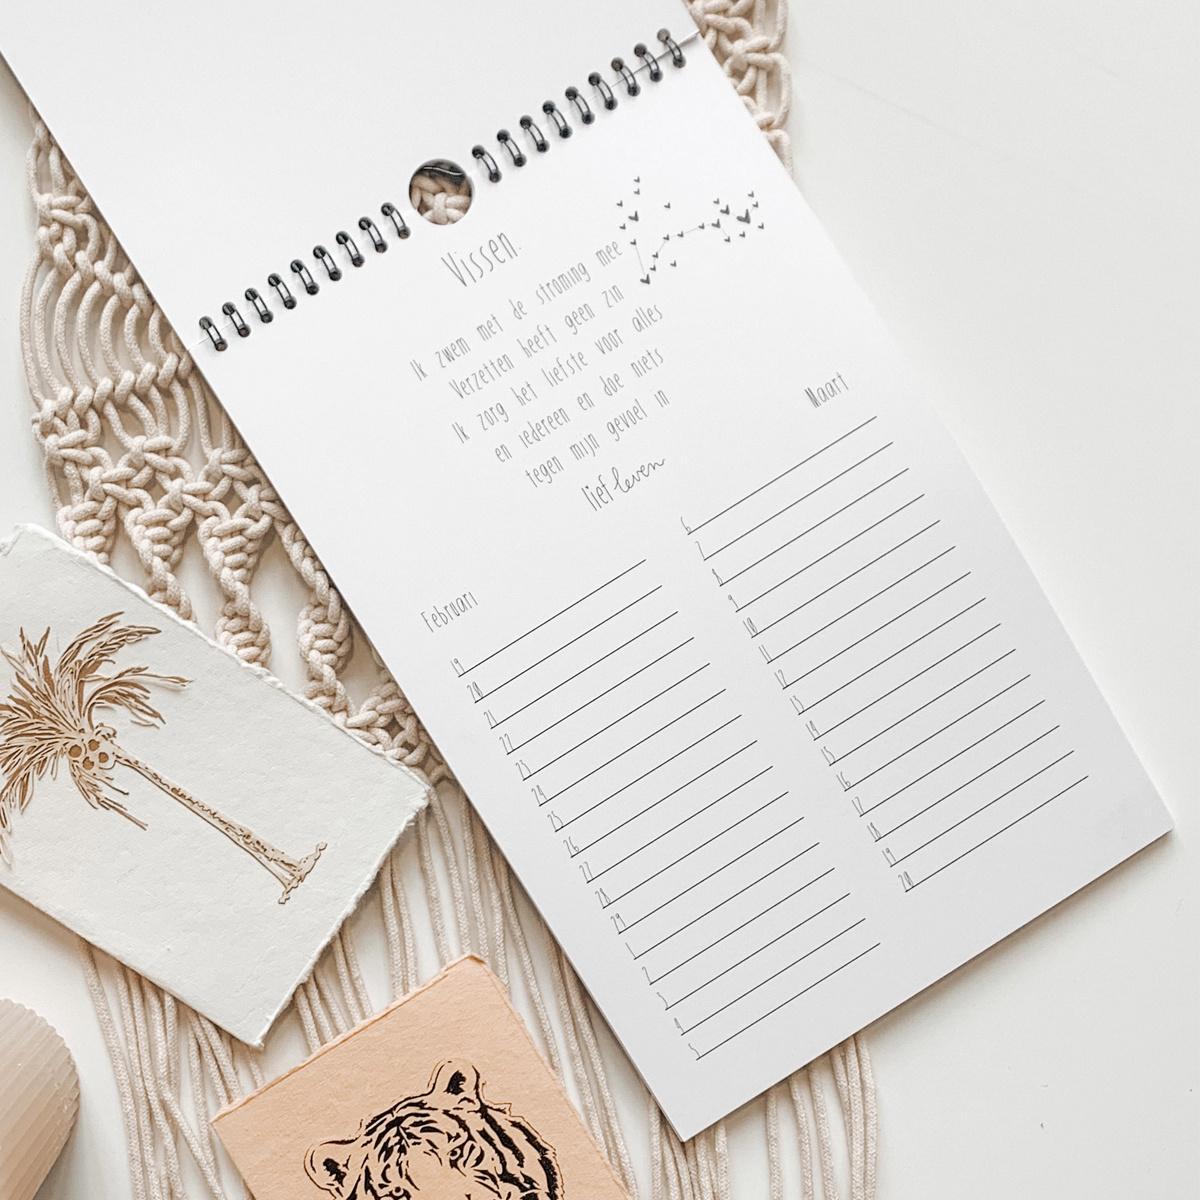 Sterrenbeeld kalender ❤